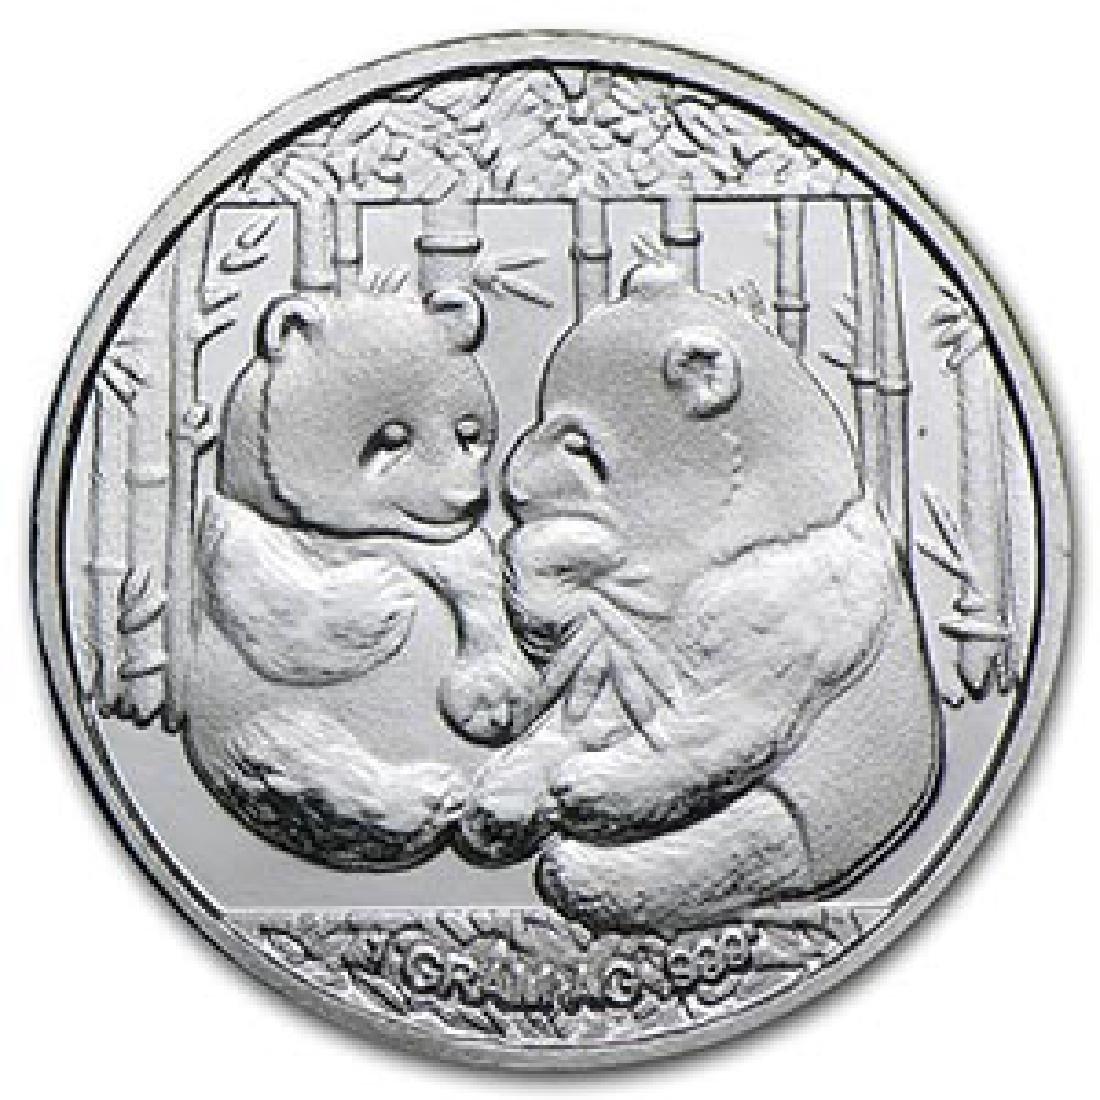 1 gram Silver Round - Panda